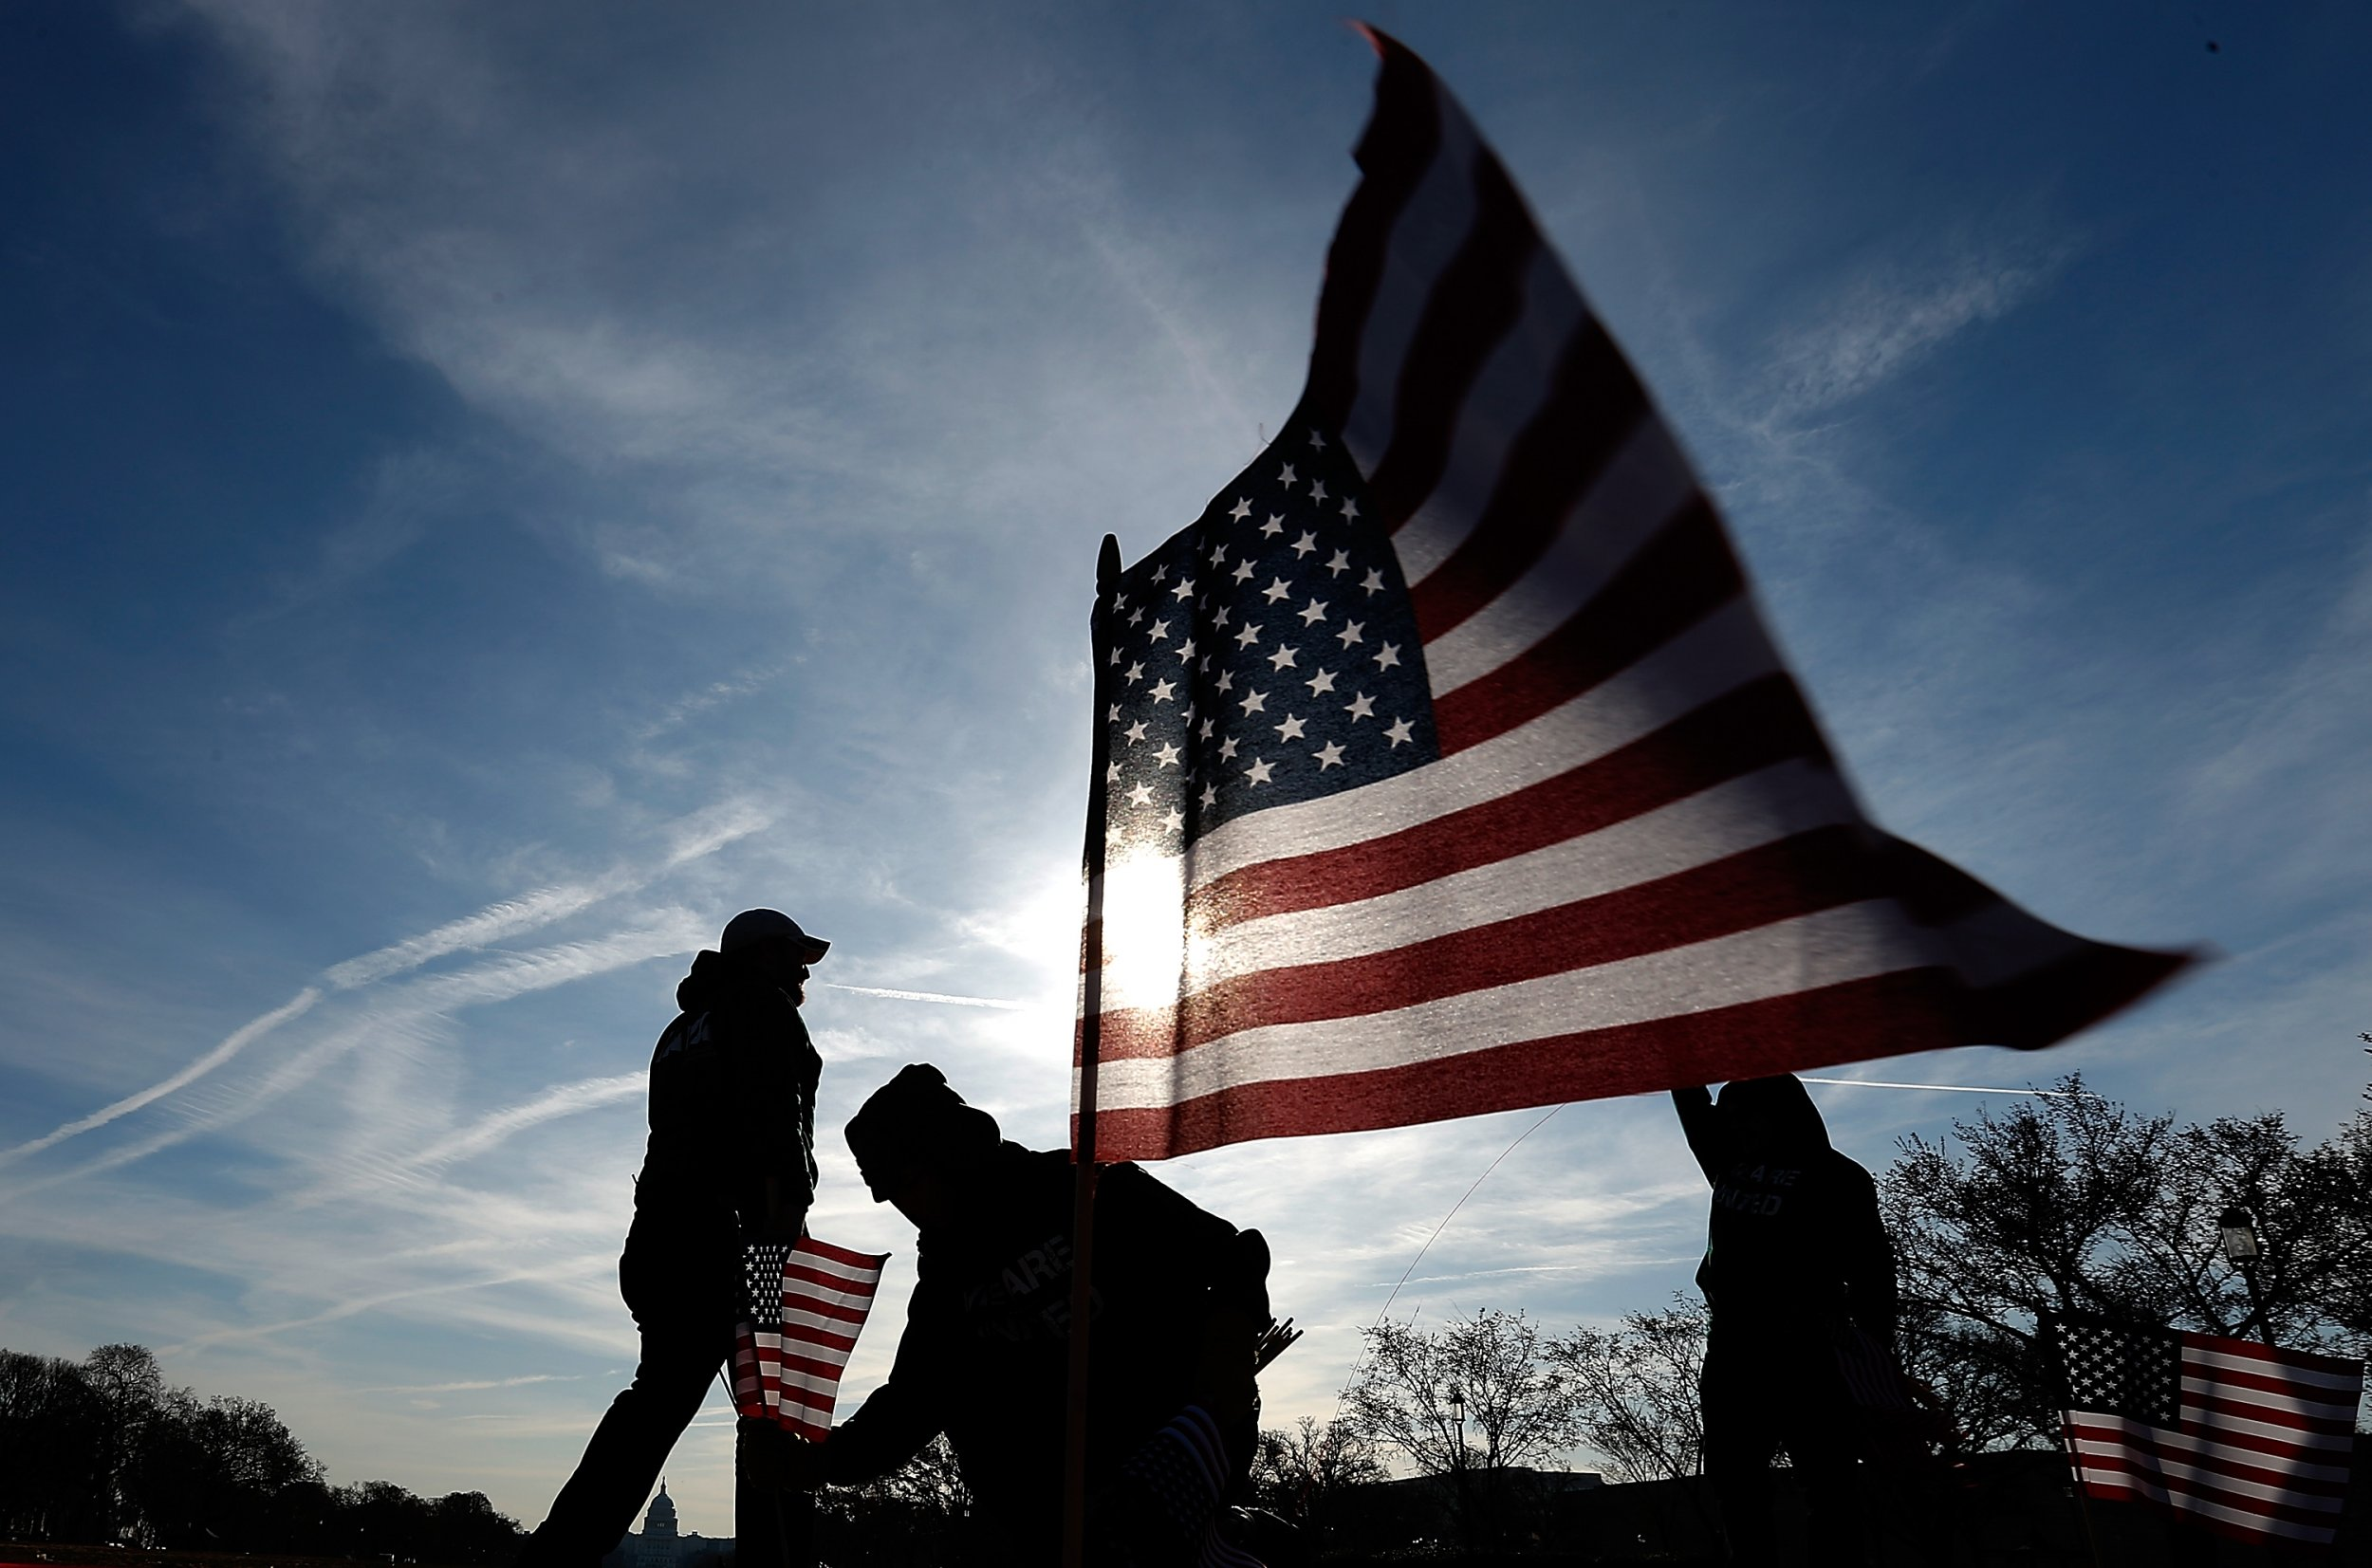 U.S. veterans flags